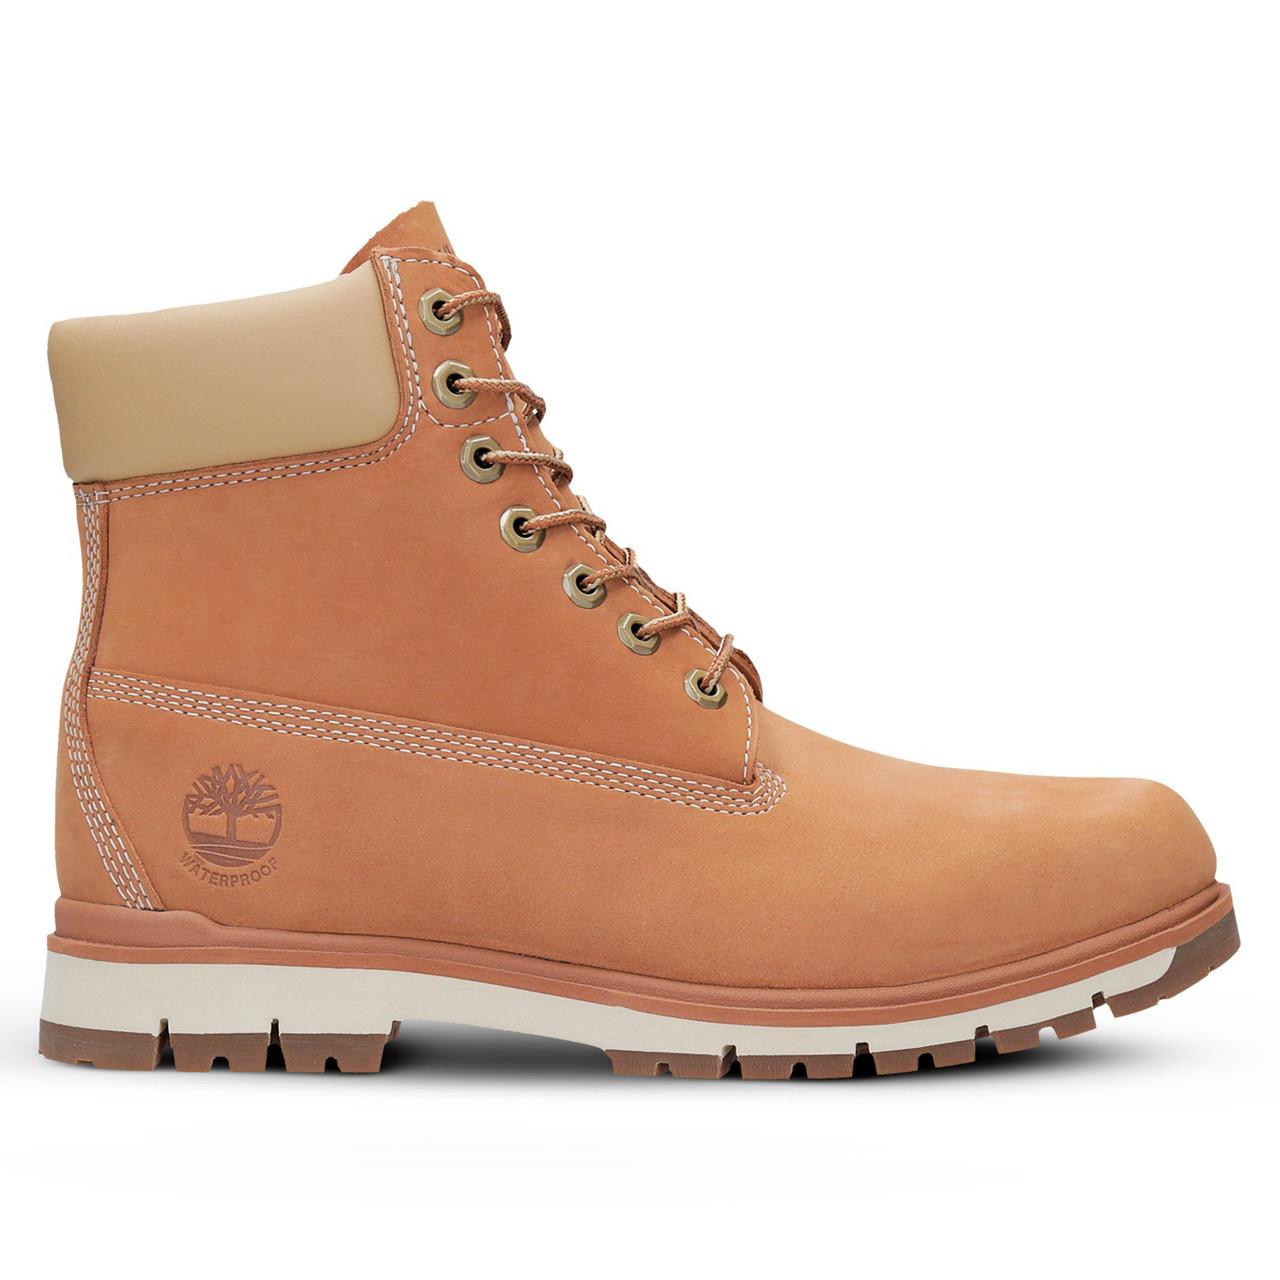 Мужские Ботинки Timberland Radford — в Категории